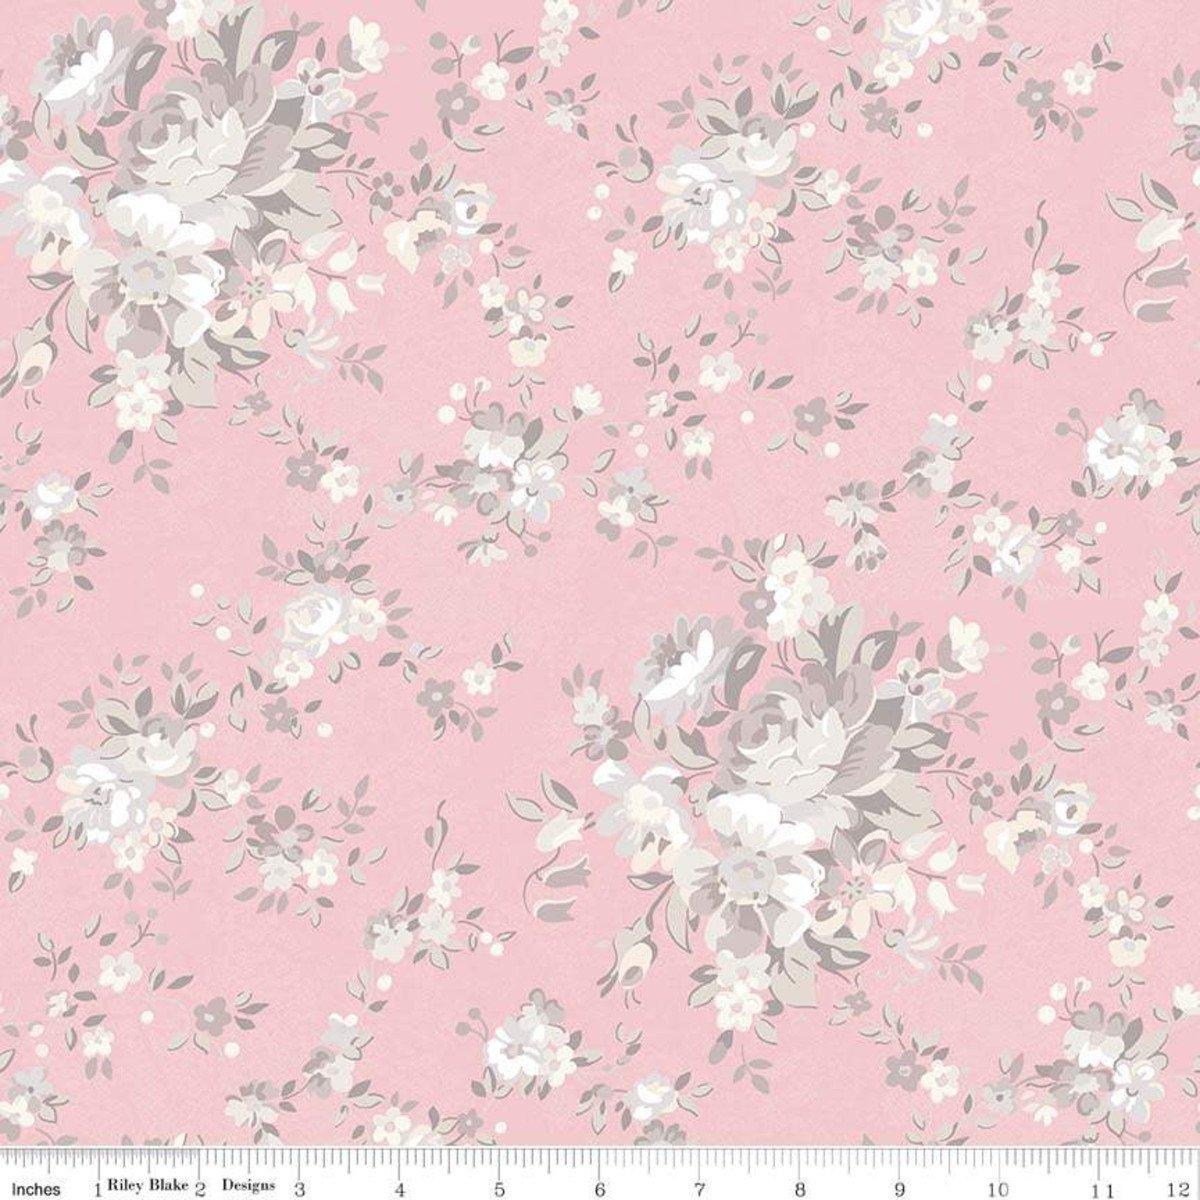 C7680-PINK_Main Floral Rose Garden